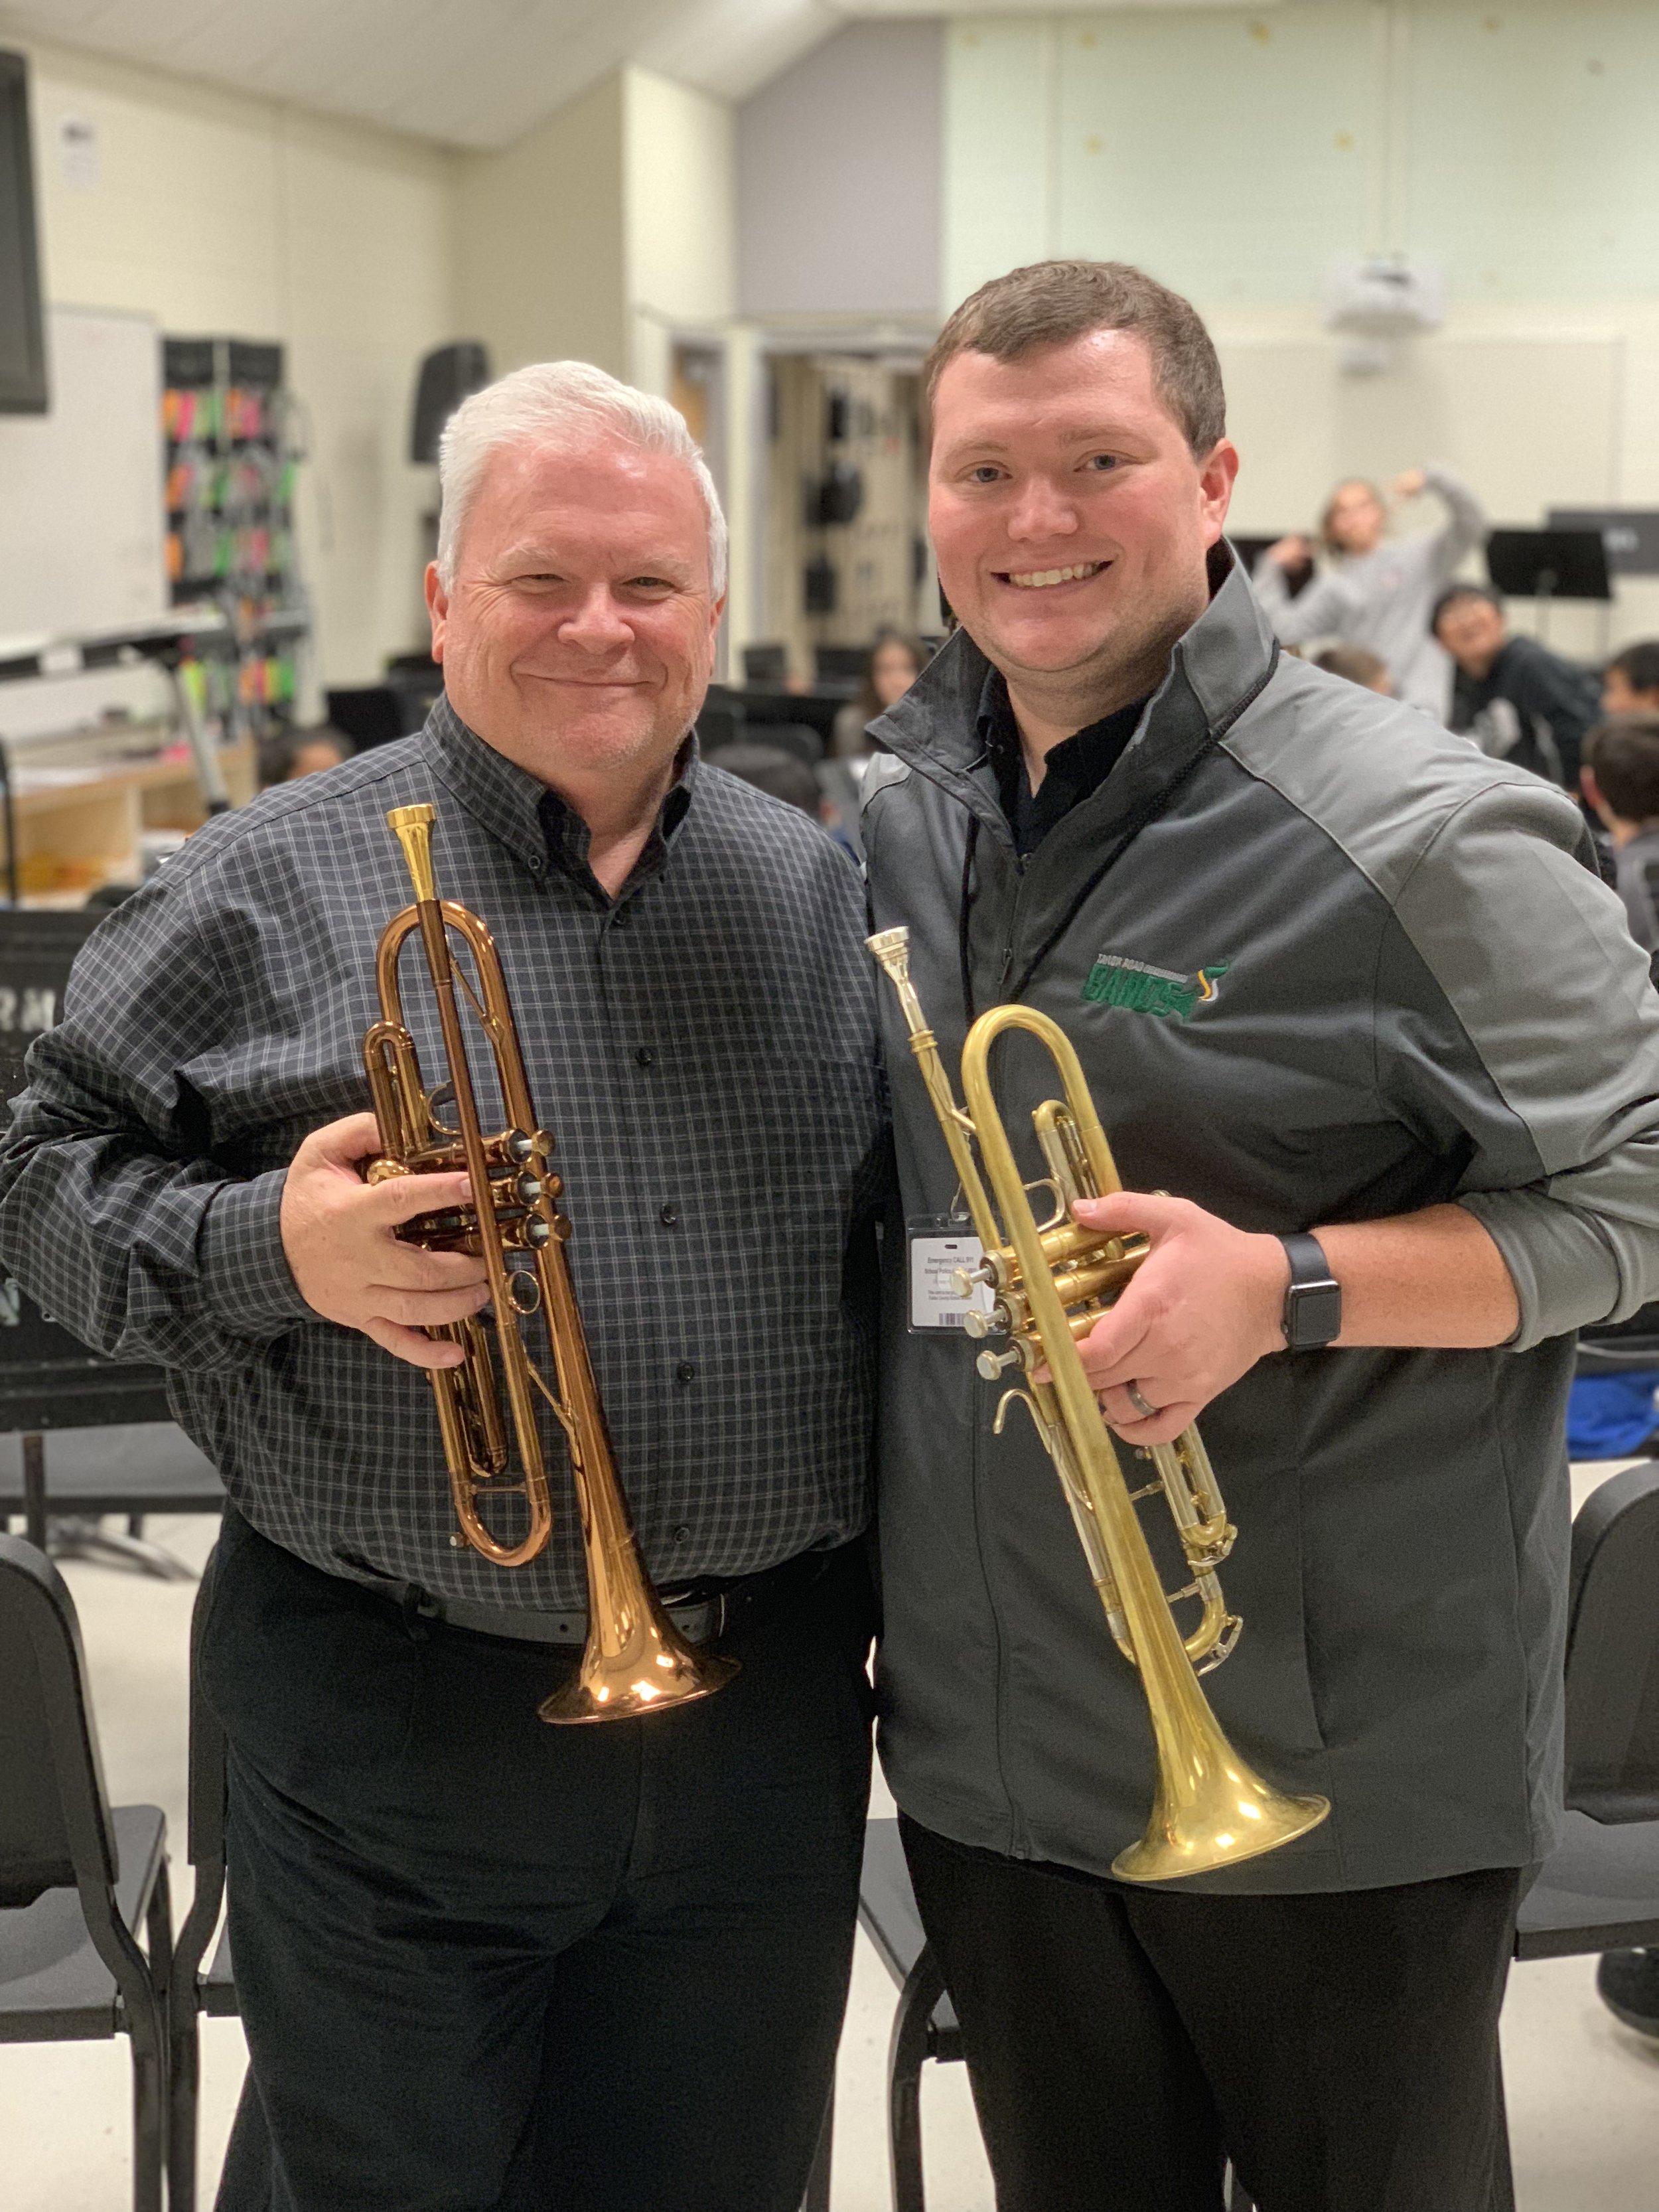 Dr. Murray was Mr. Soloff's trumpet professor in college!